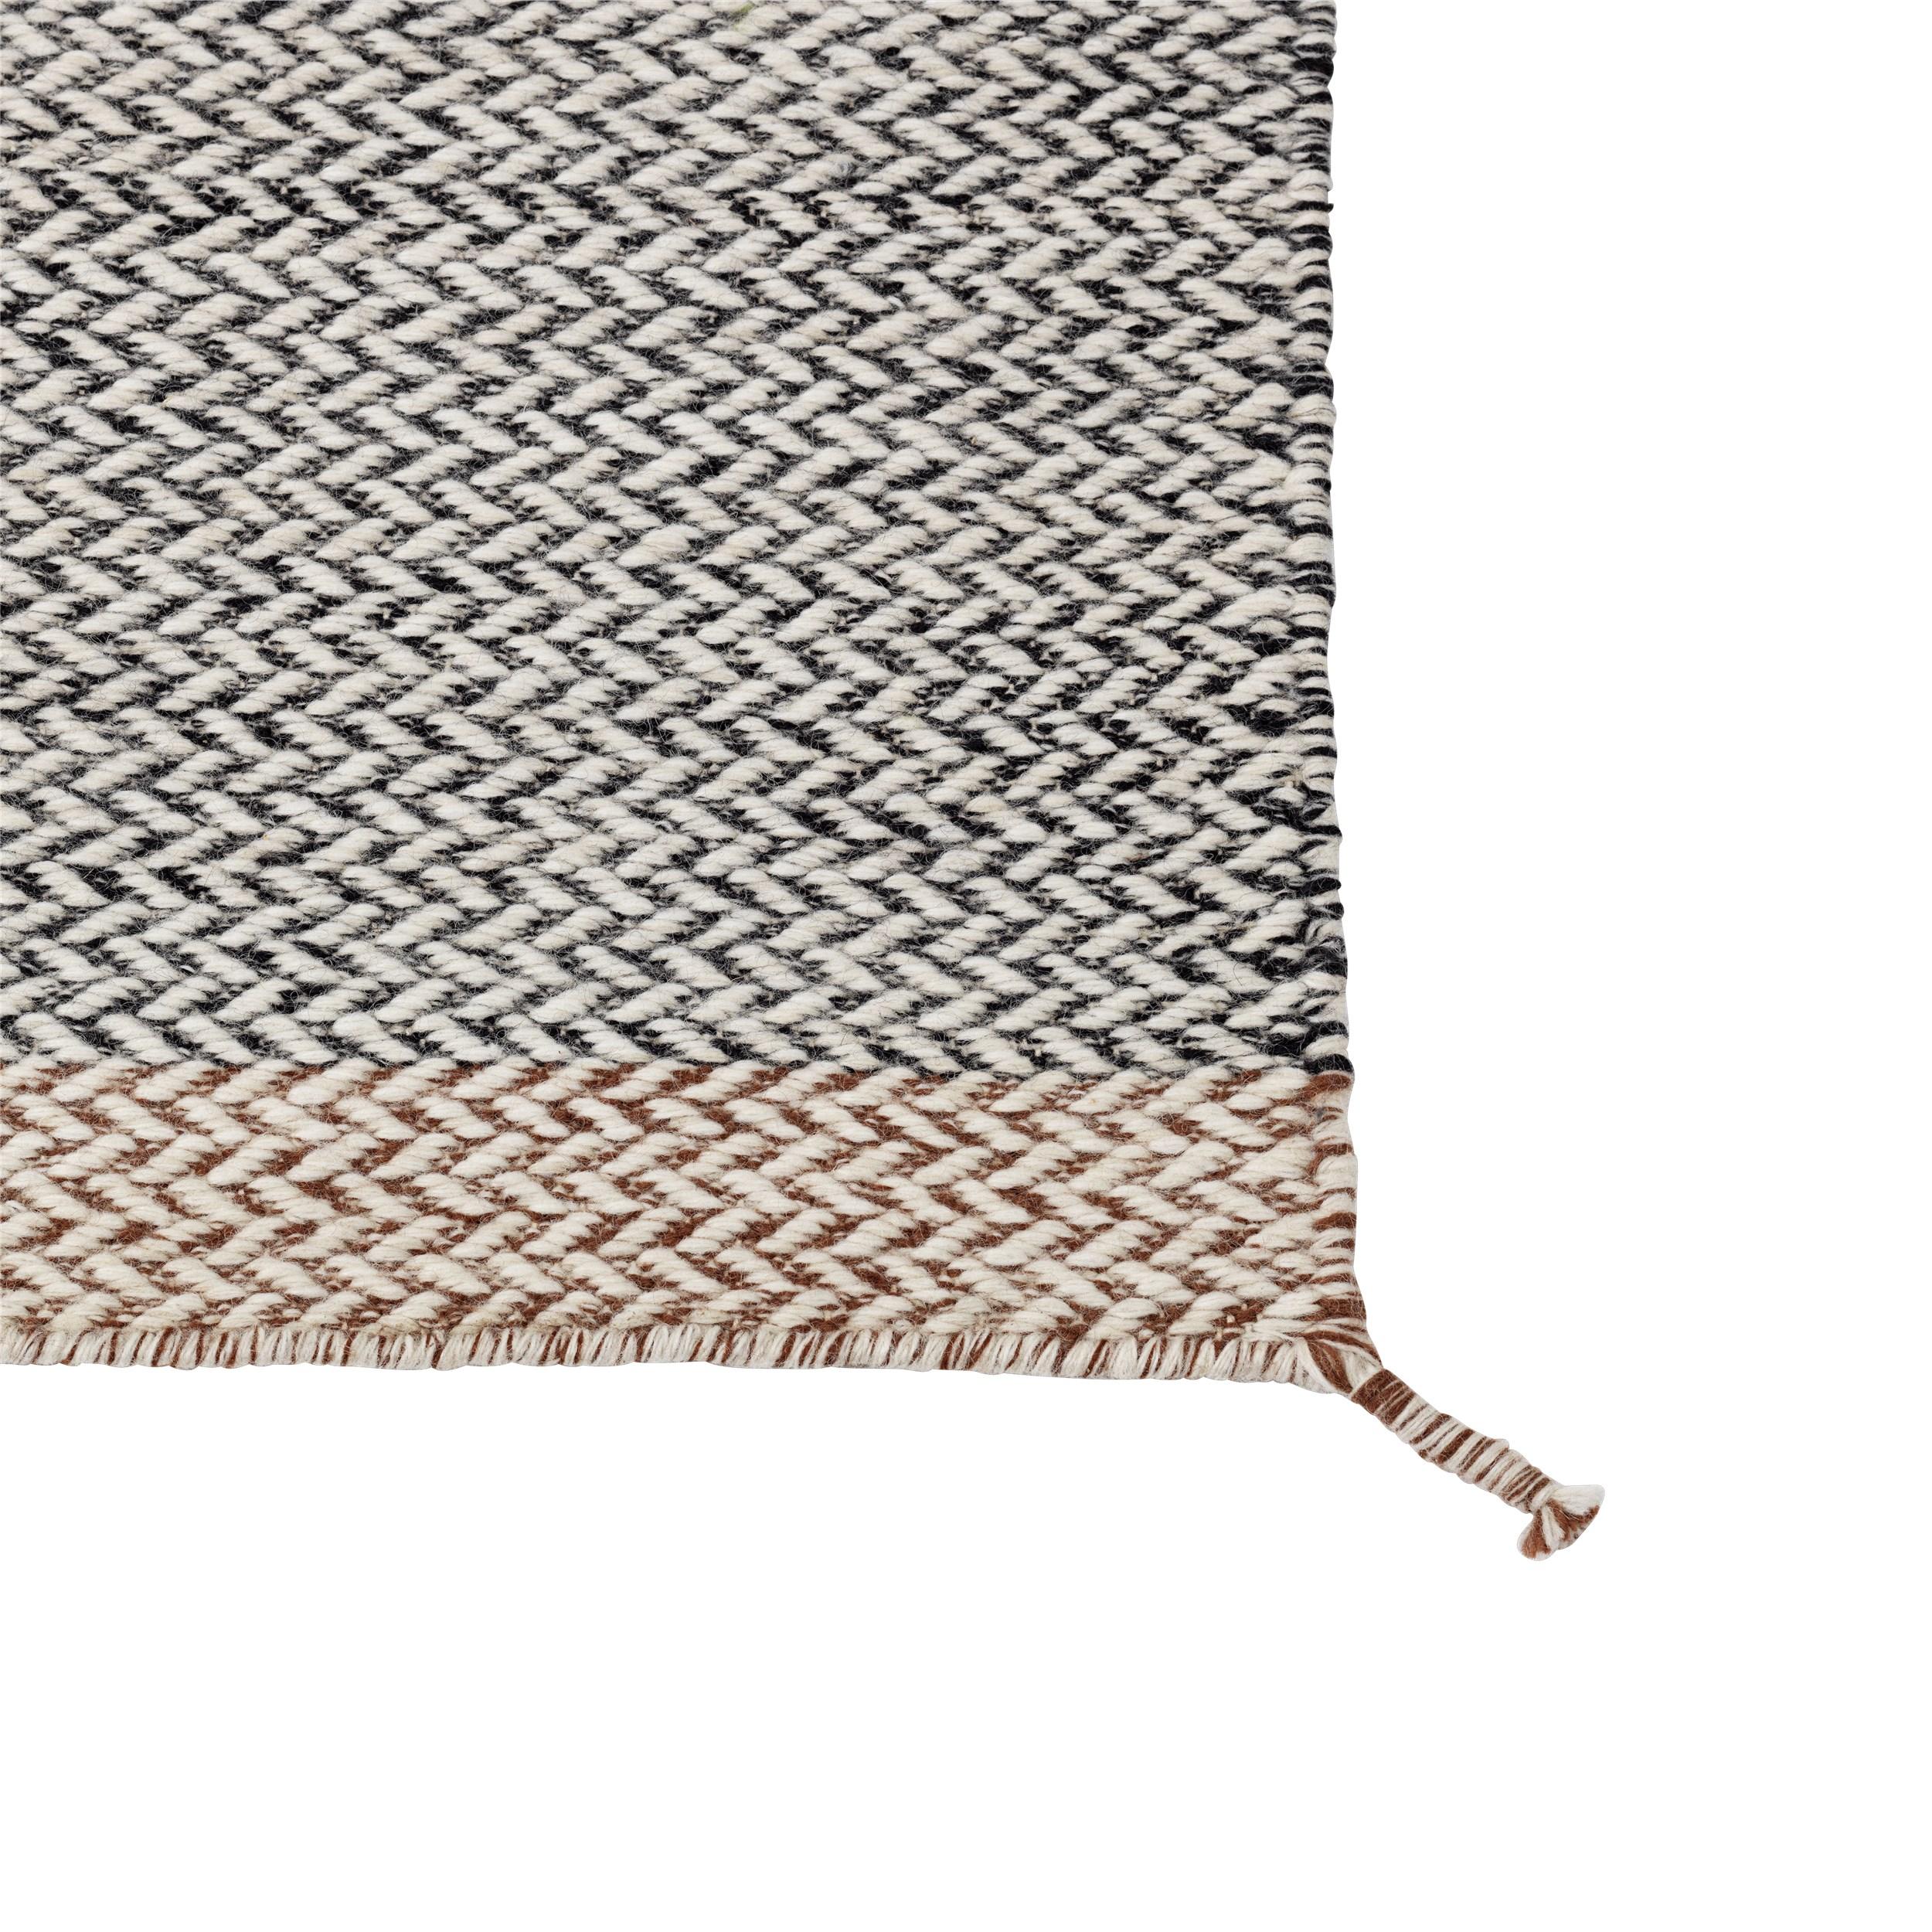 Ply rug 85 x 140 black-white